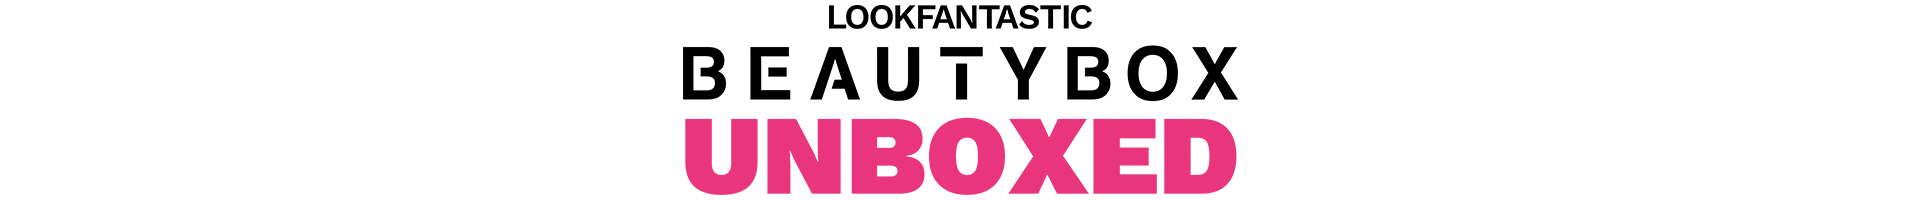 Beauty Box Unboxed